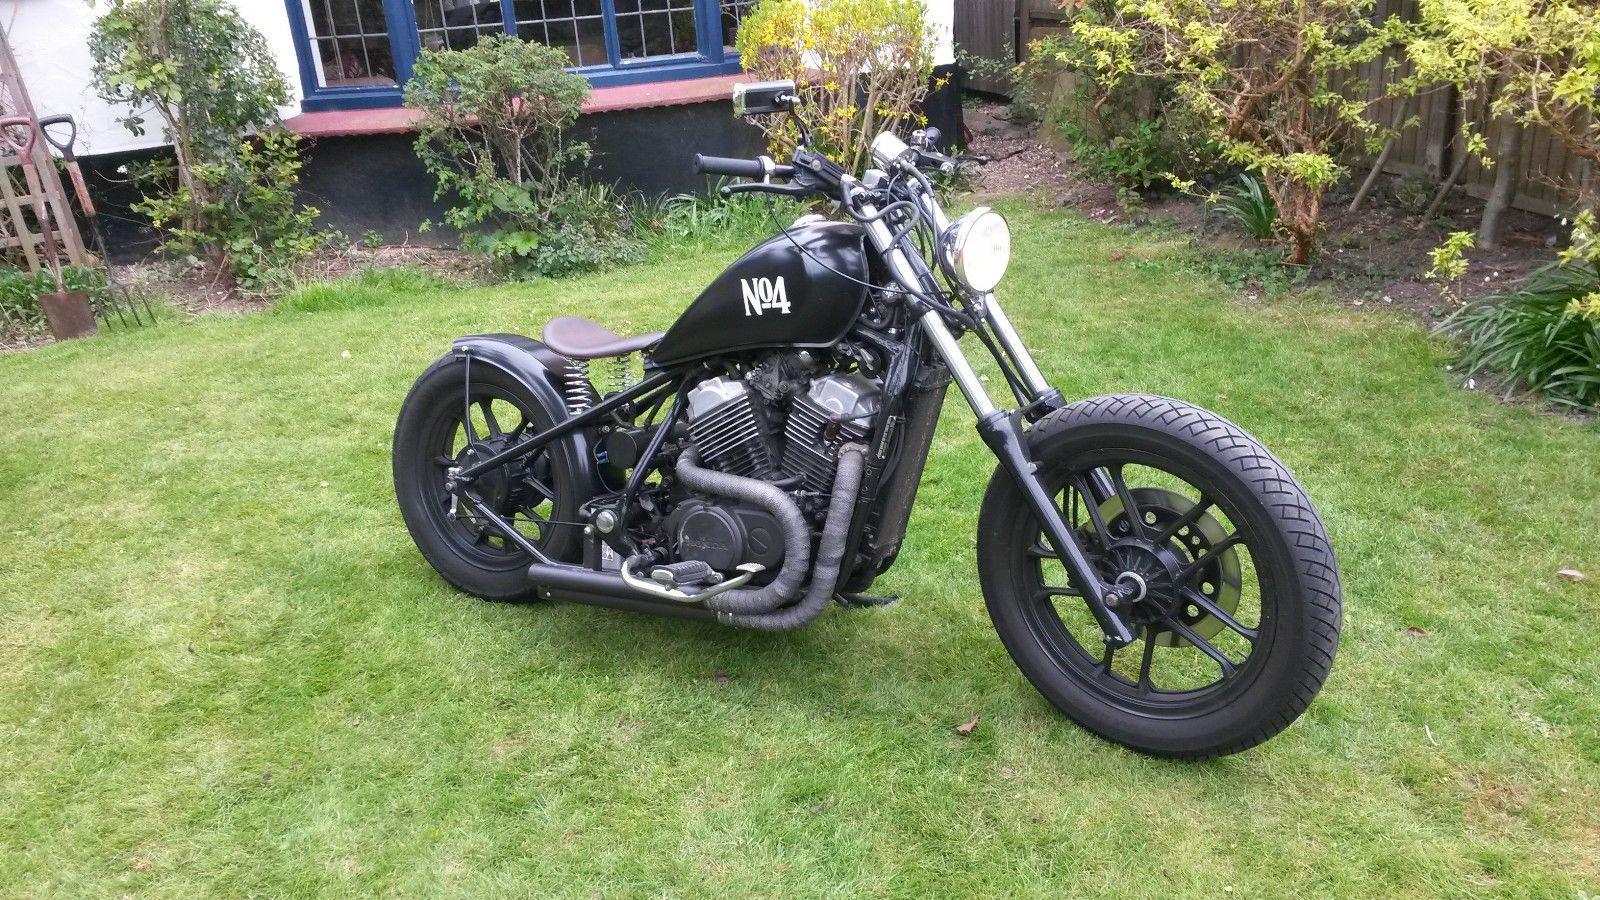 HONDA SHADOW VT500 BOBBER CHOPPER 1984 | eBay | motos ...